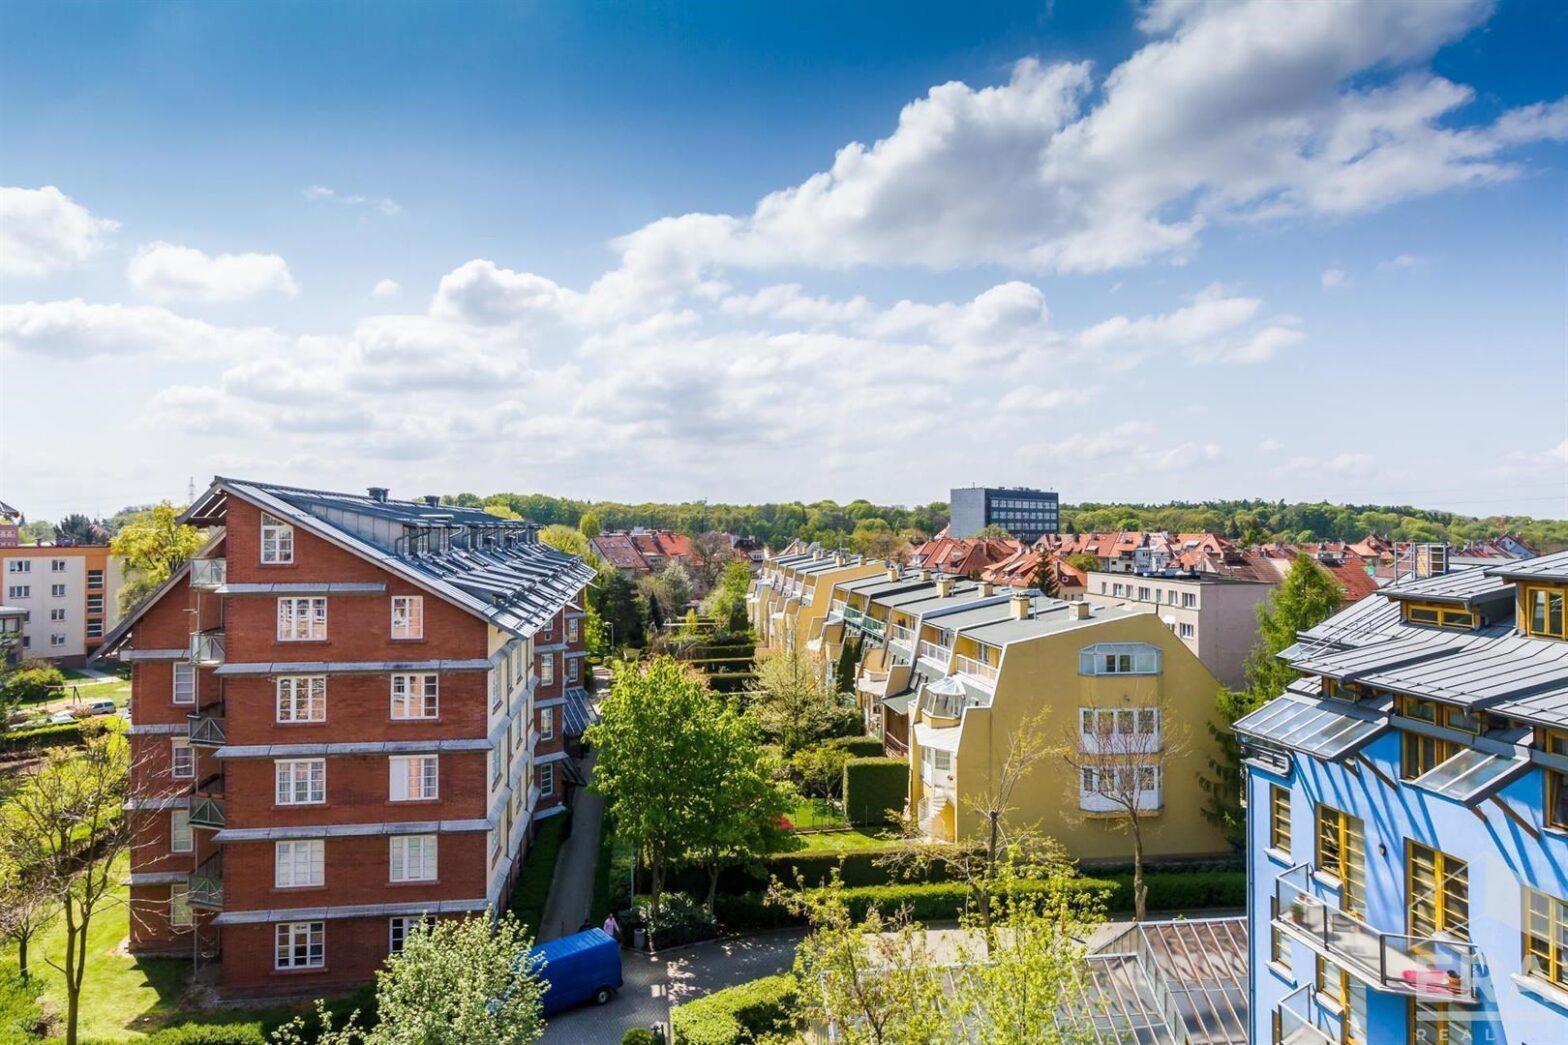 PRODÁNO – Prodej bytu 4+kk/2xB, 98,15m2, ulice Na Okraji, Praha 6 – Veleslavín